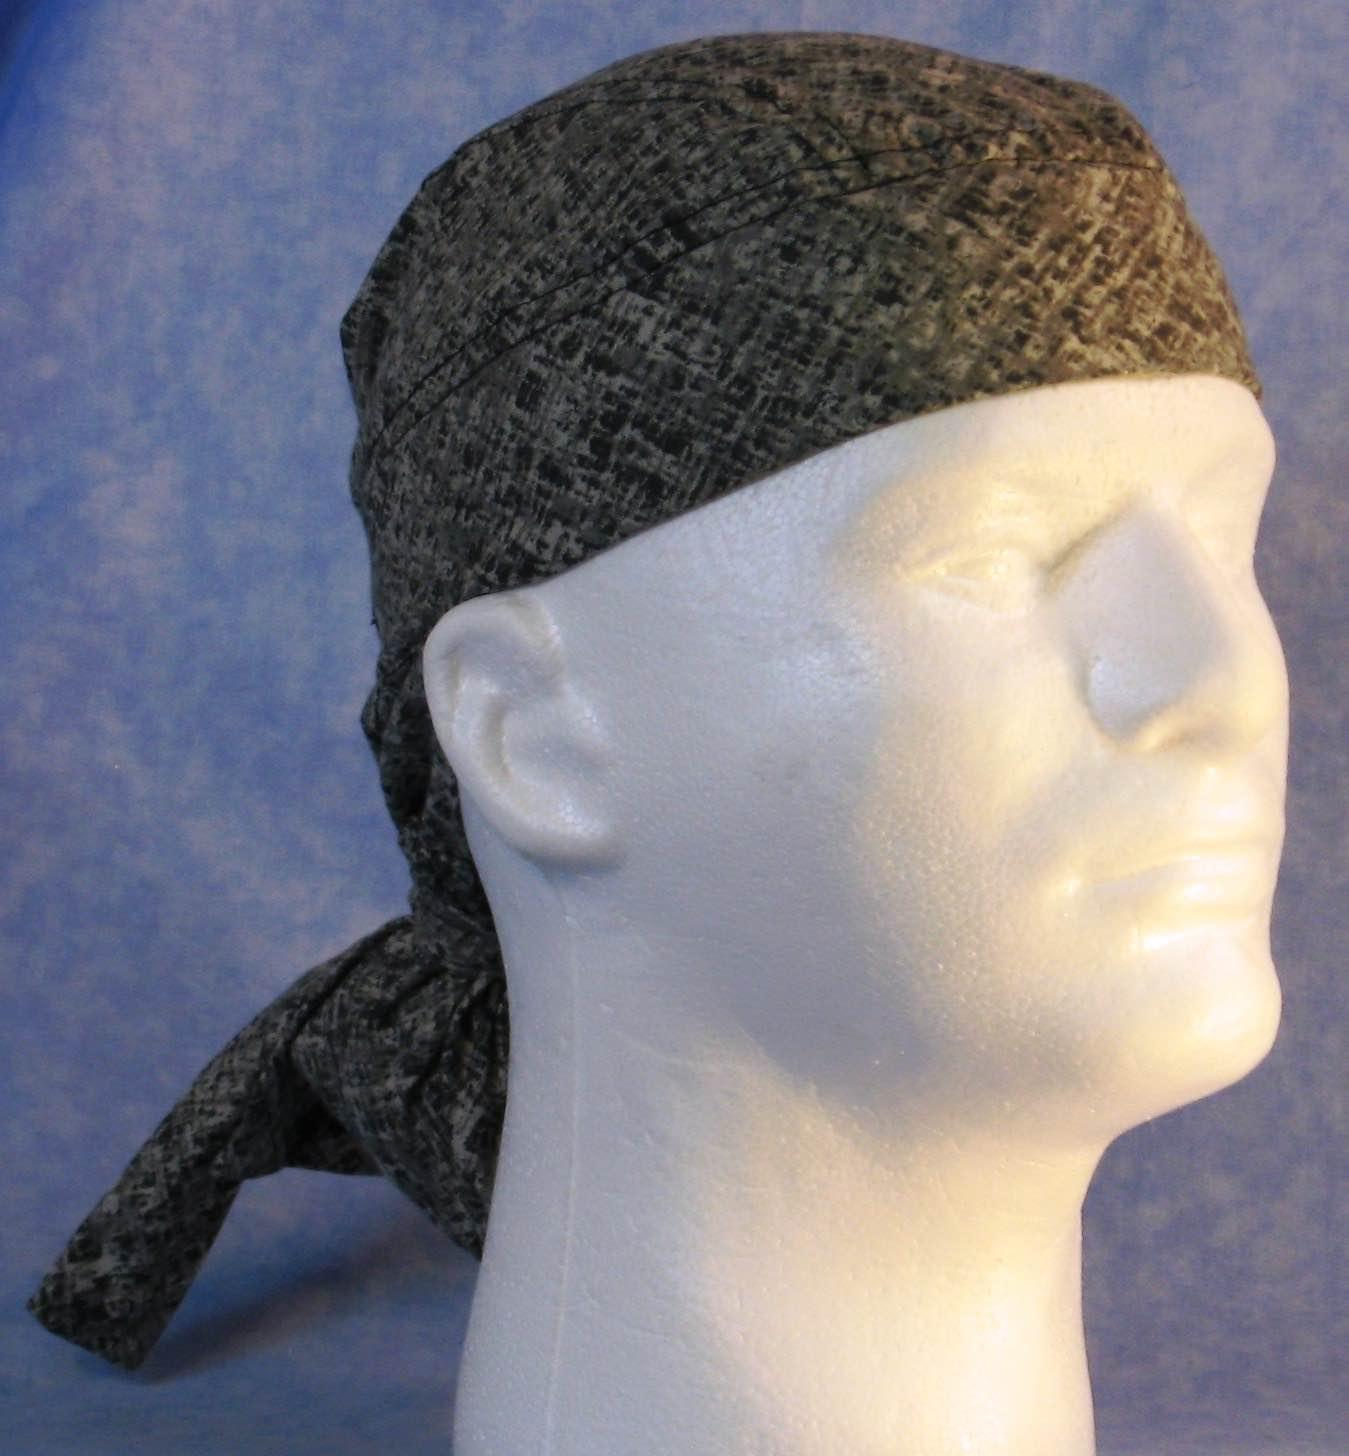 Hair Bag Do Rag in Gray Crosshatch Plaid - Youth L-XL-Adult S